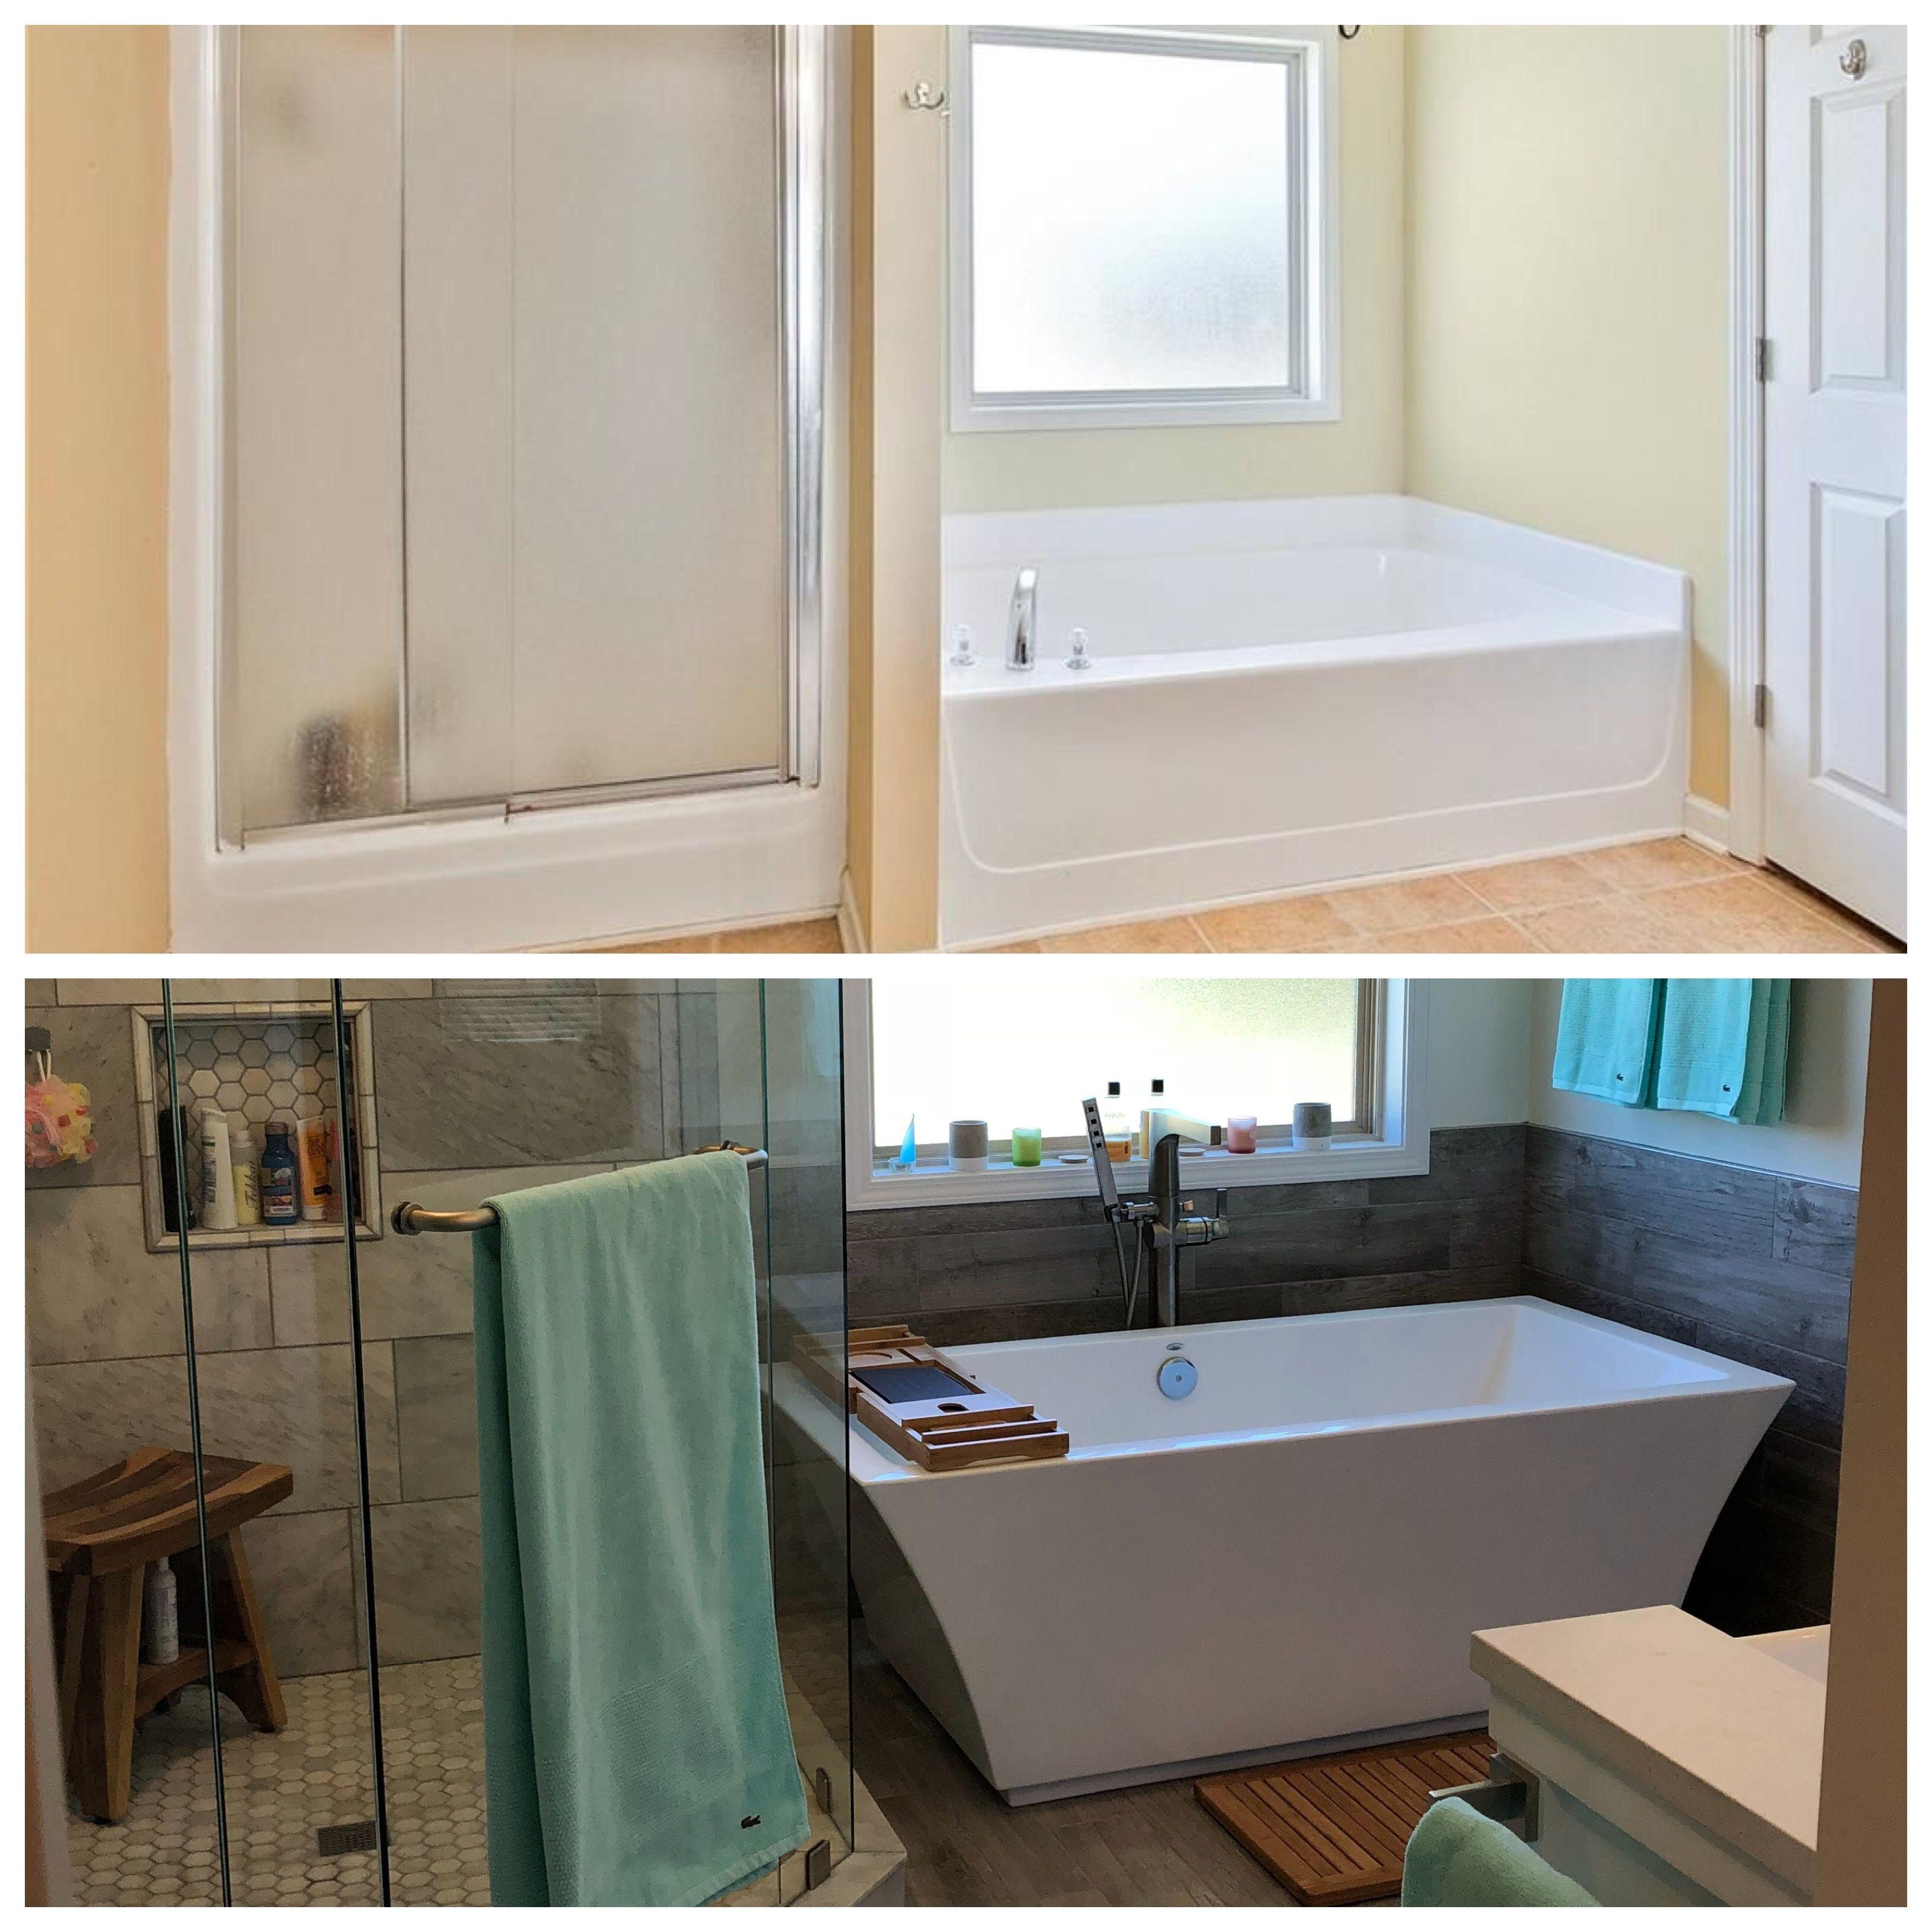 Master Bath Renovation Free standing tub Hexagon tiles Walk in shower Glass doors Farm sink vanity Edison lights